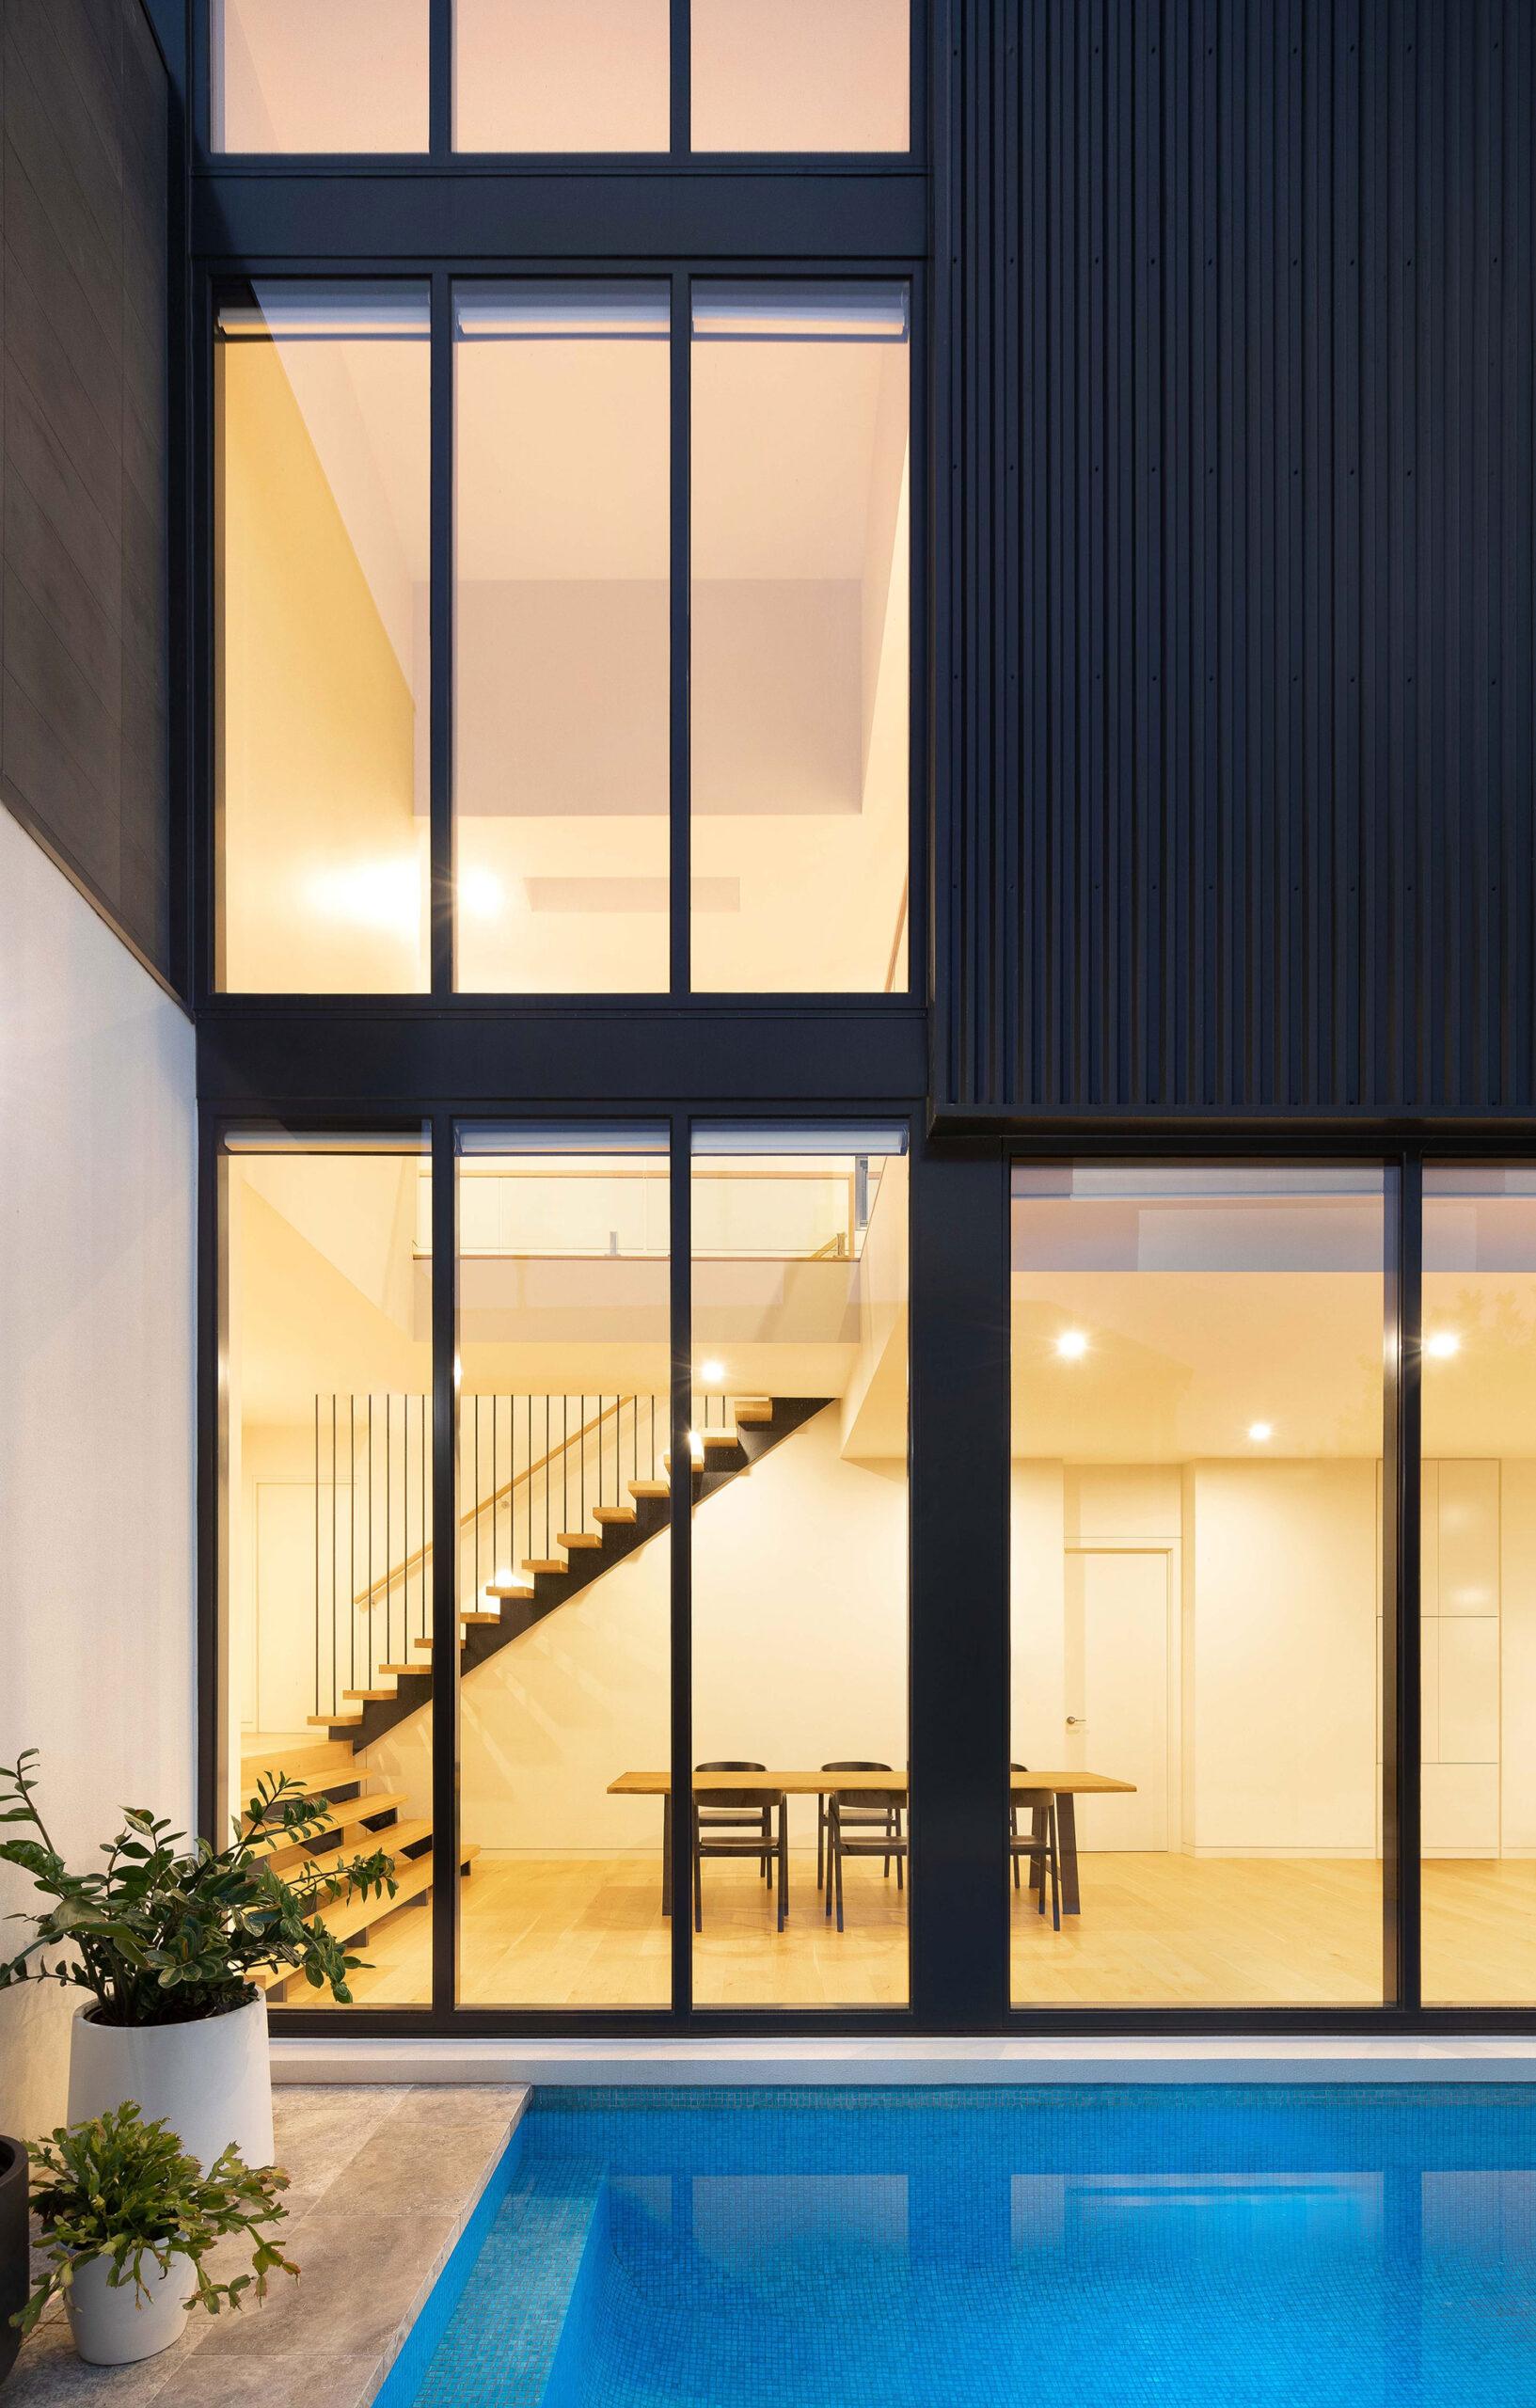 northcote-house-interior-design-stairwell-pool-area-ckairouz-architects